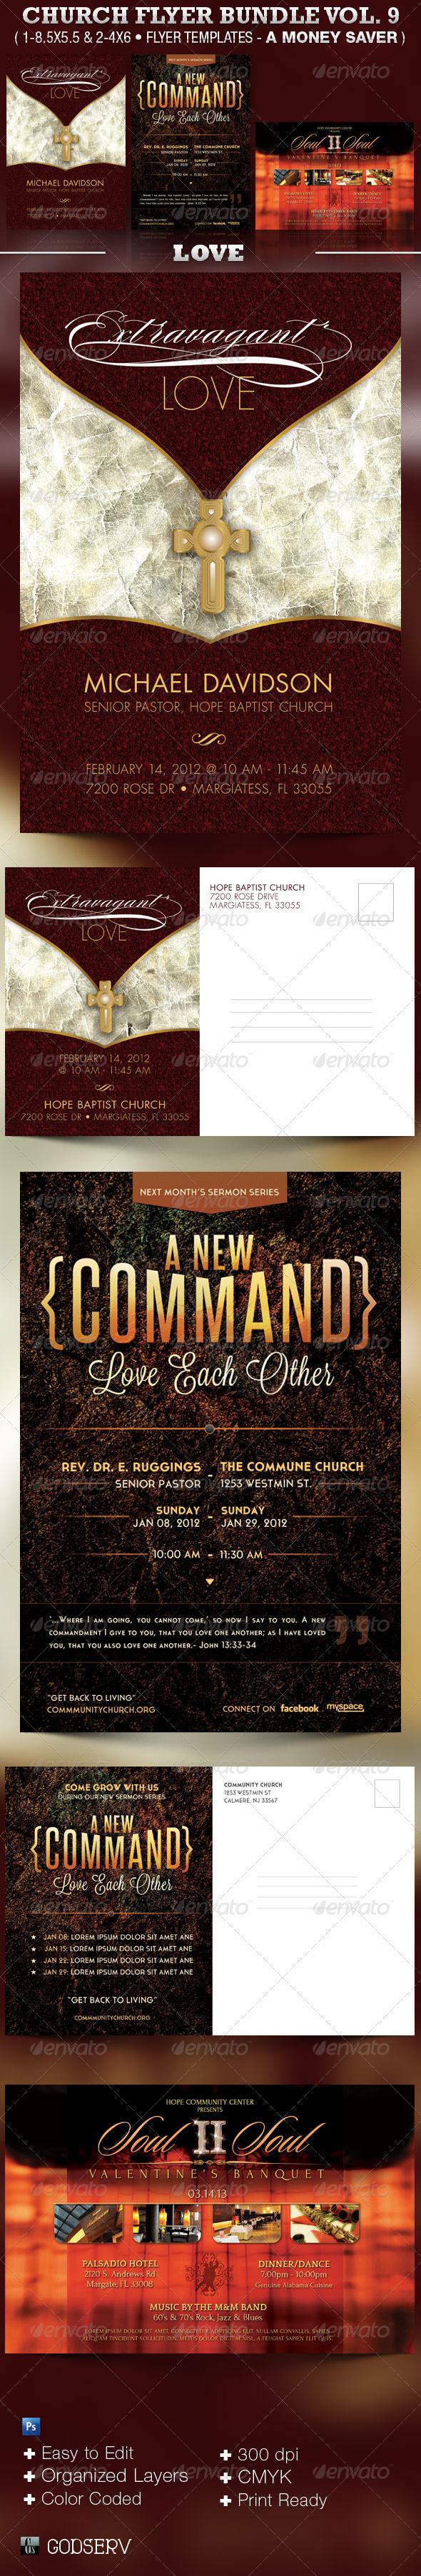 Love Church Flyer Template Bundle - Church Flyers